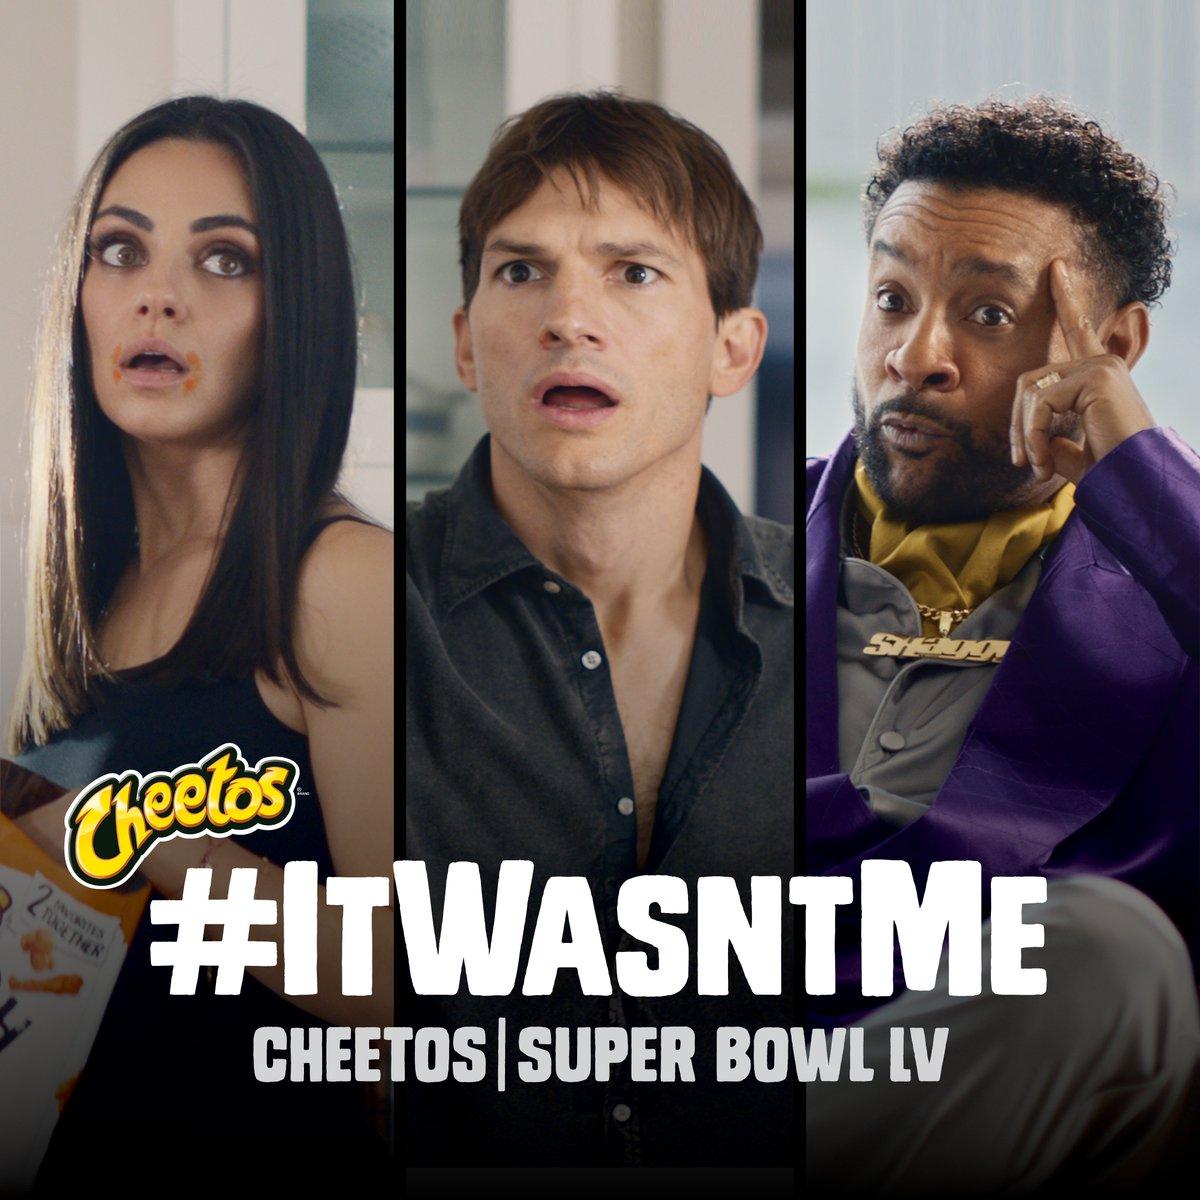 Replying to @pehota: Best commercial of the #SuperBowl so far @ChesterCheetah  Also, I love Mila Kunis and Ashton Kutcher.